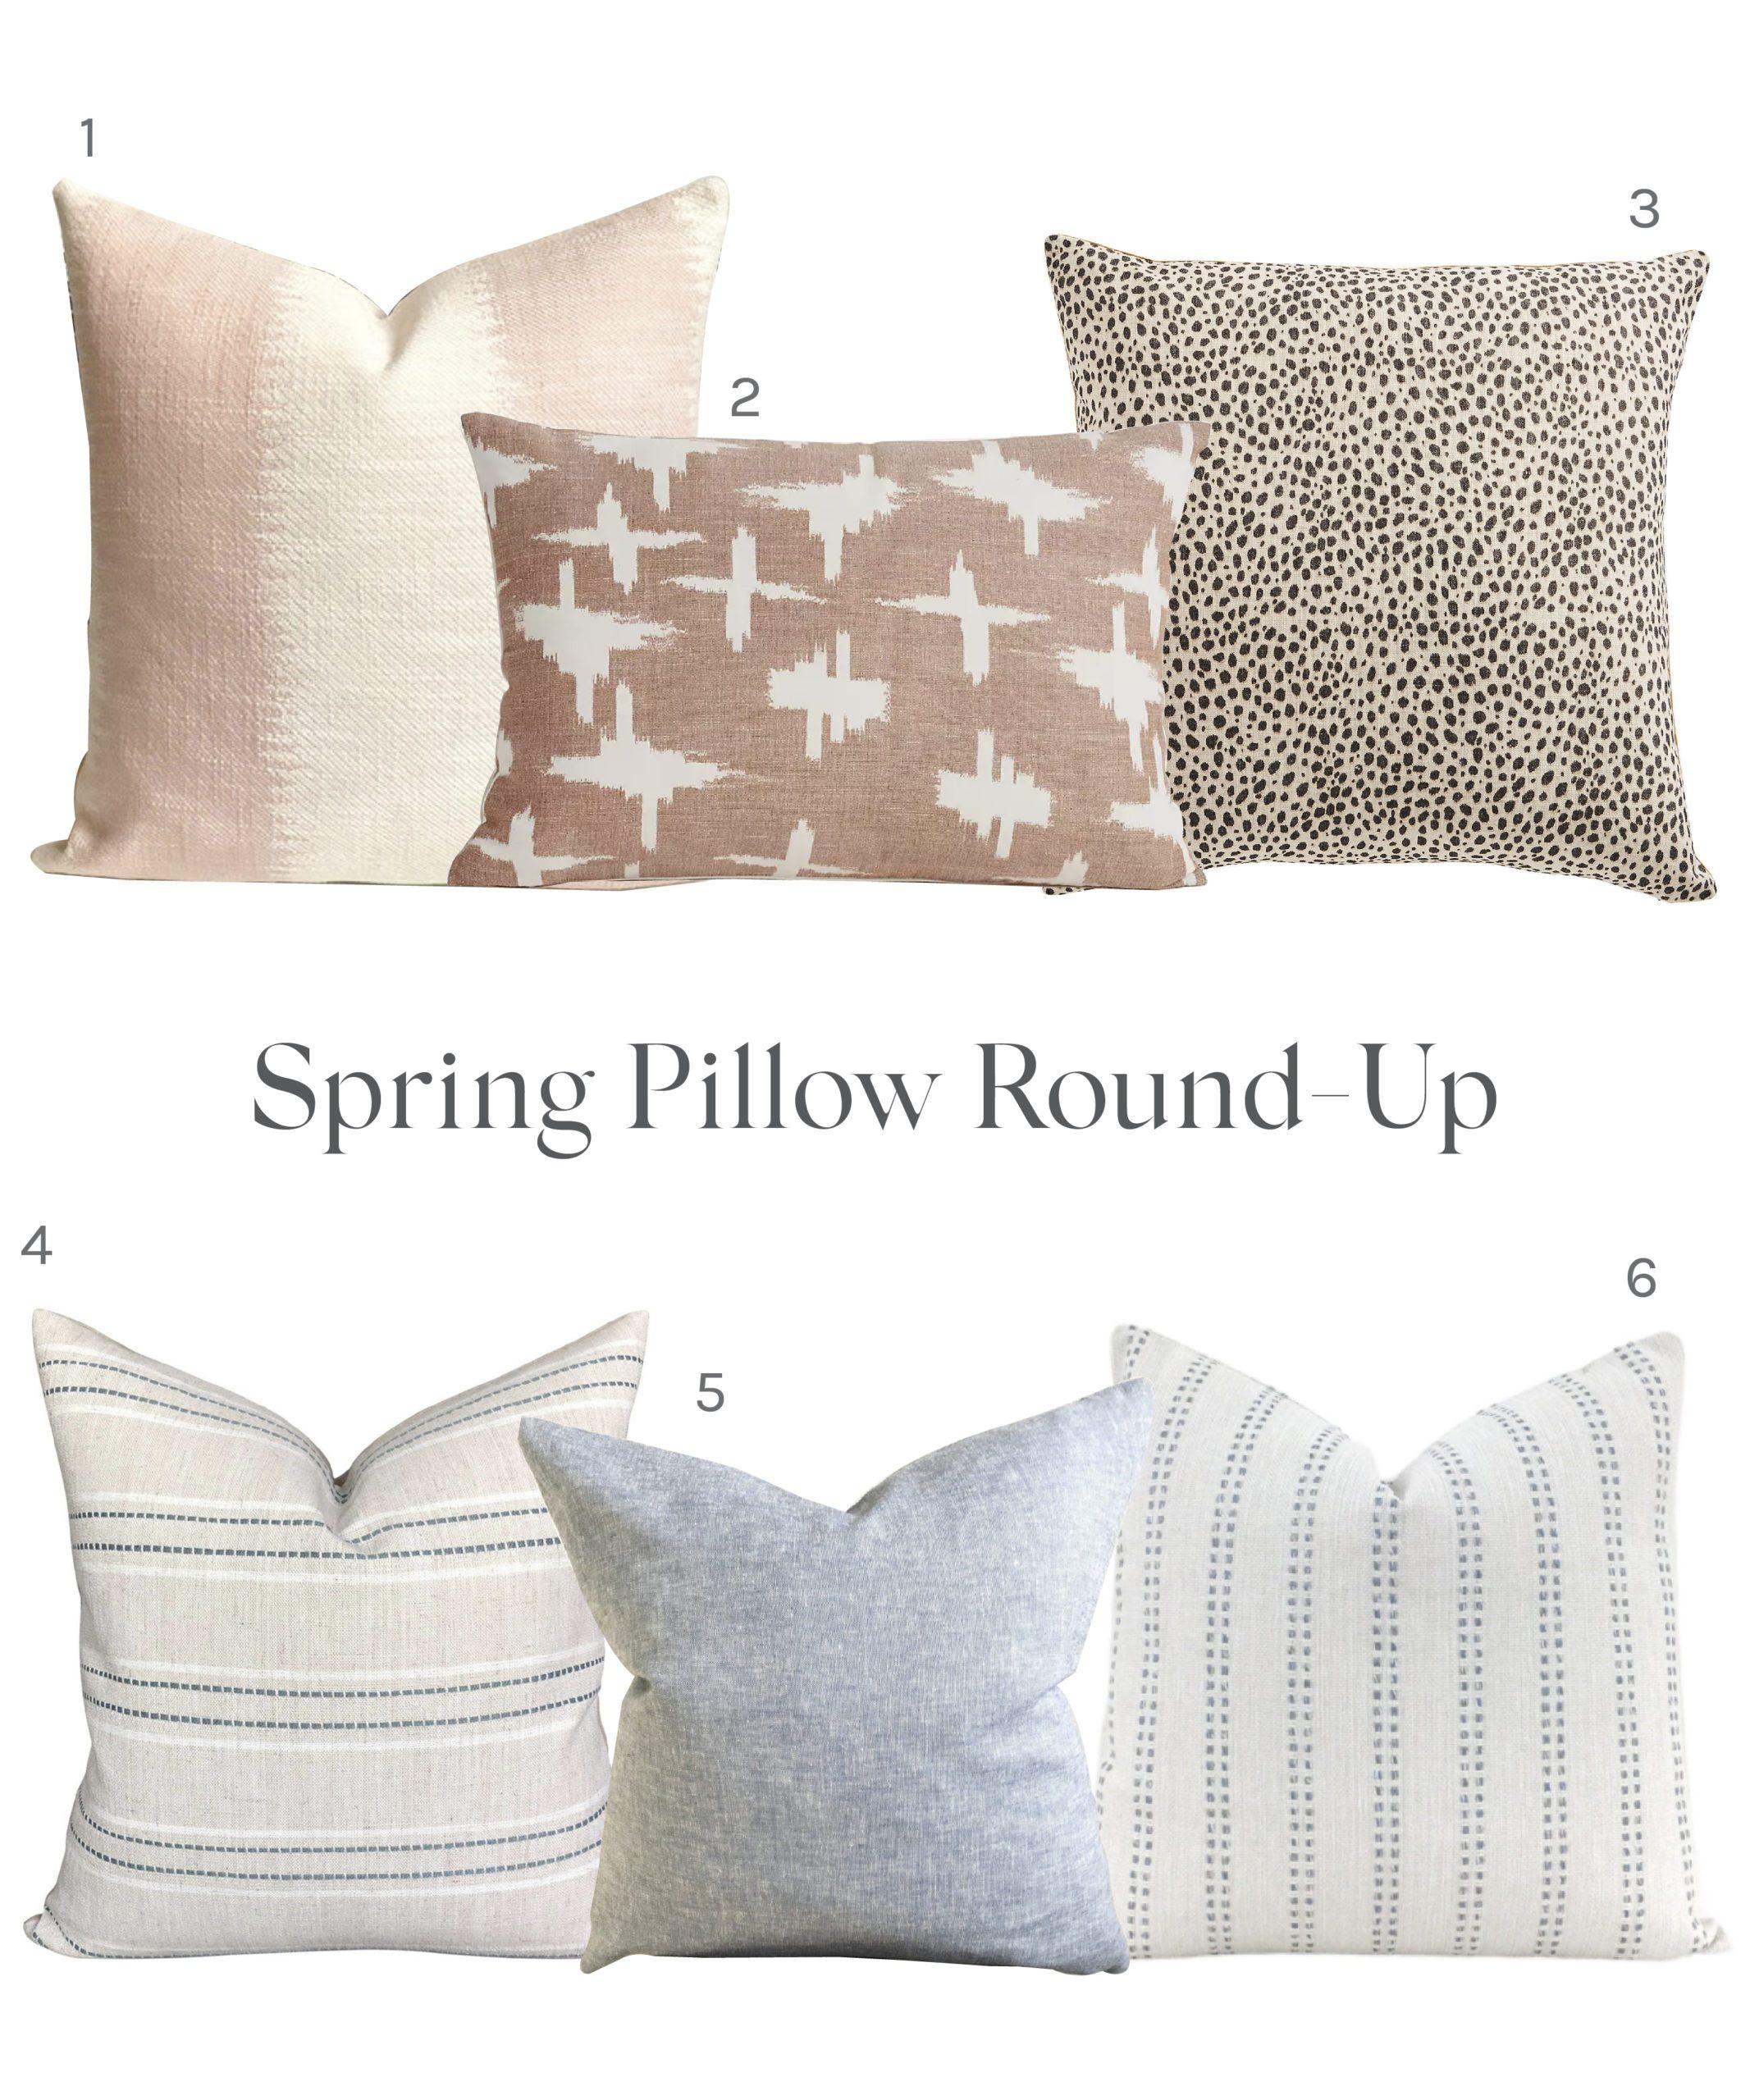 Jillian Harris Pillow Round up! Her 6 Favourite Pillows for Spring 2021.